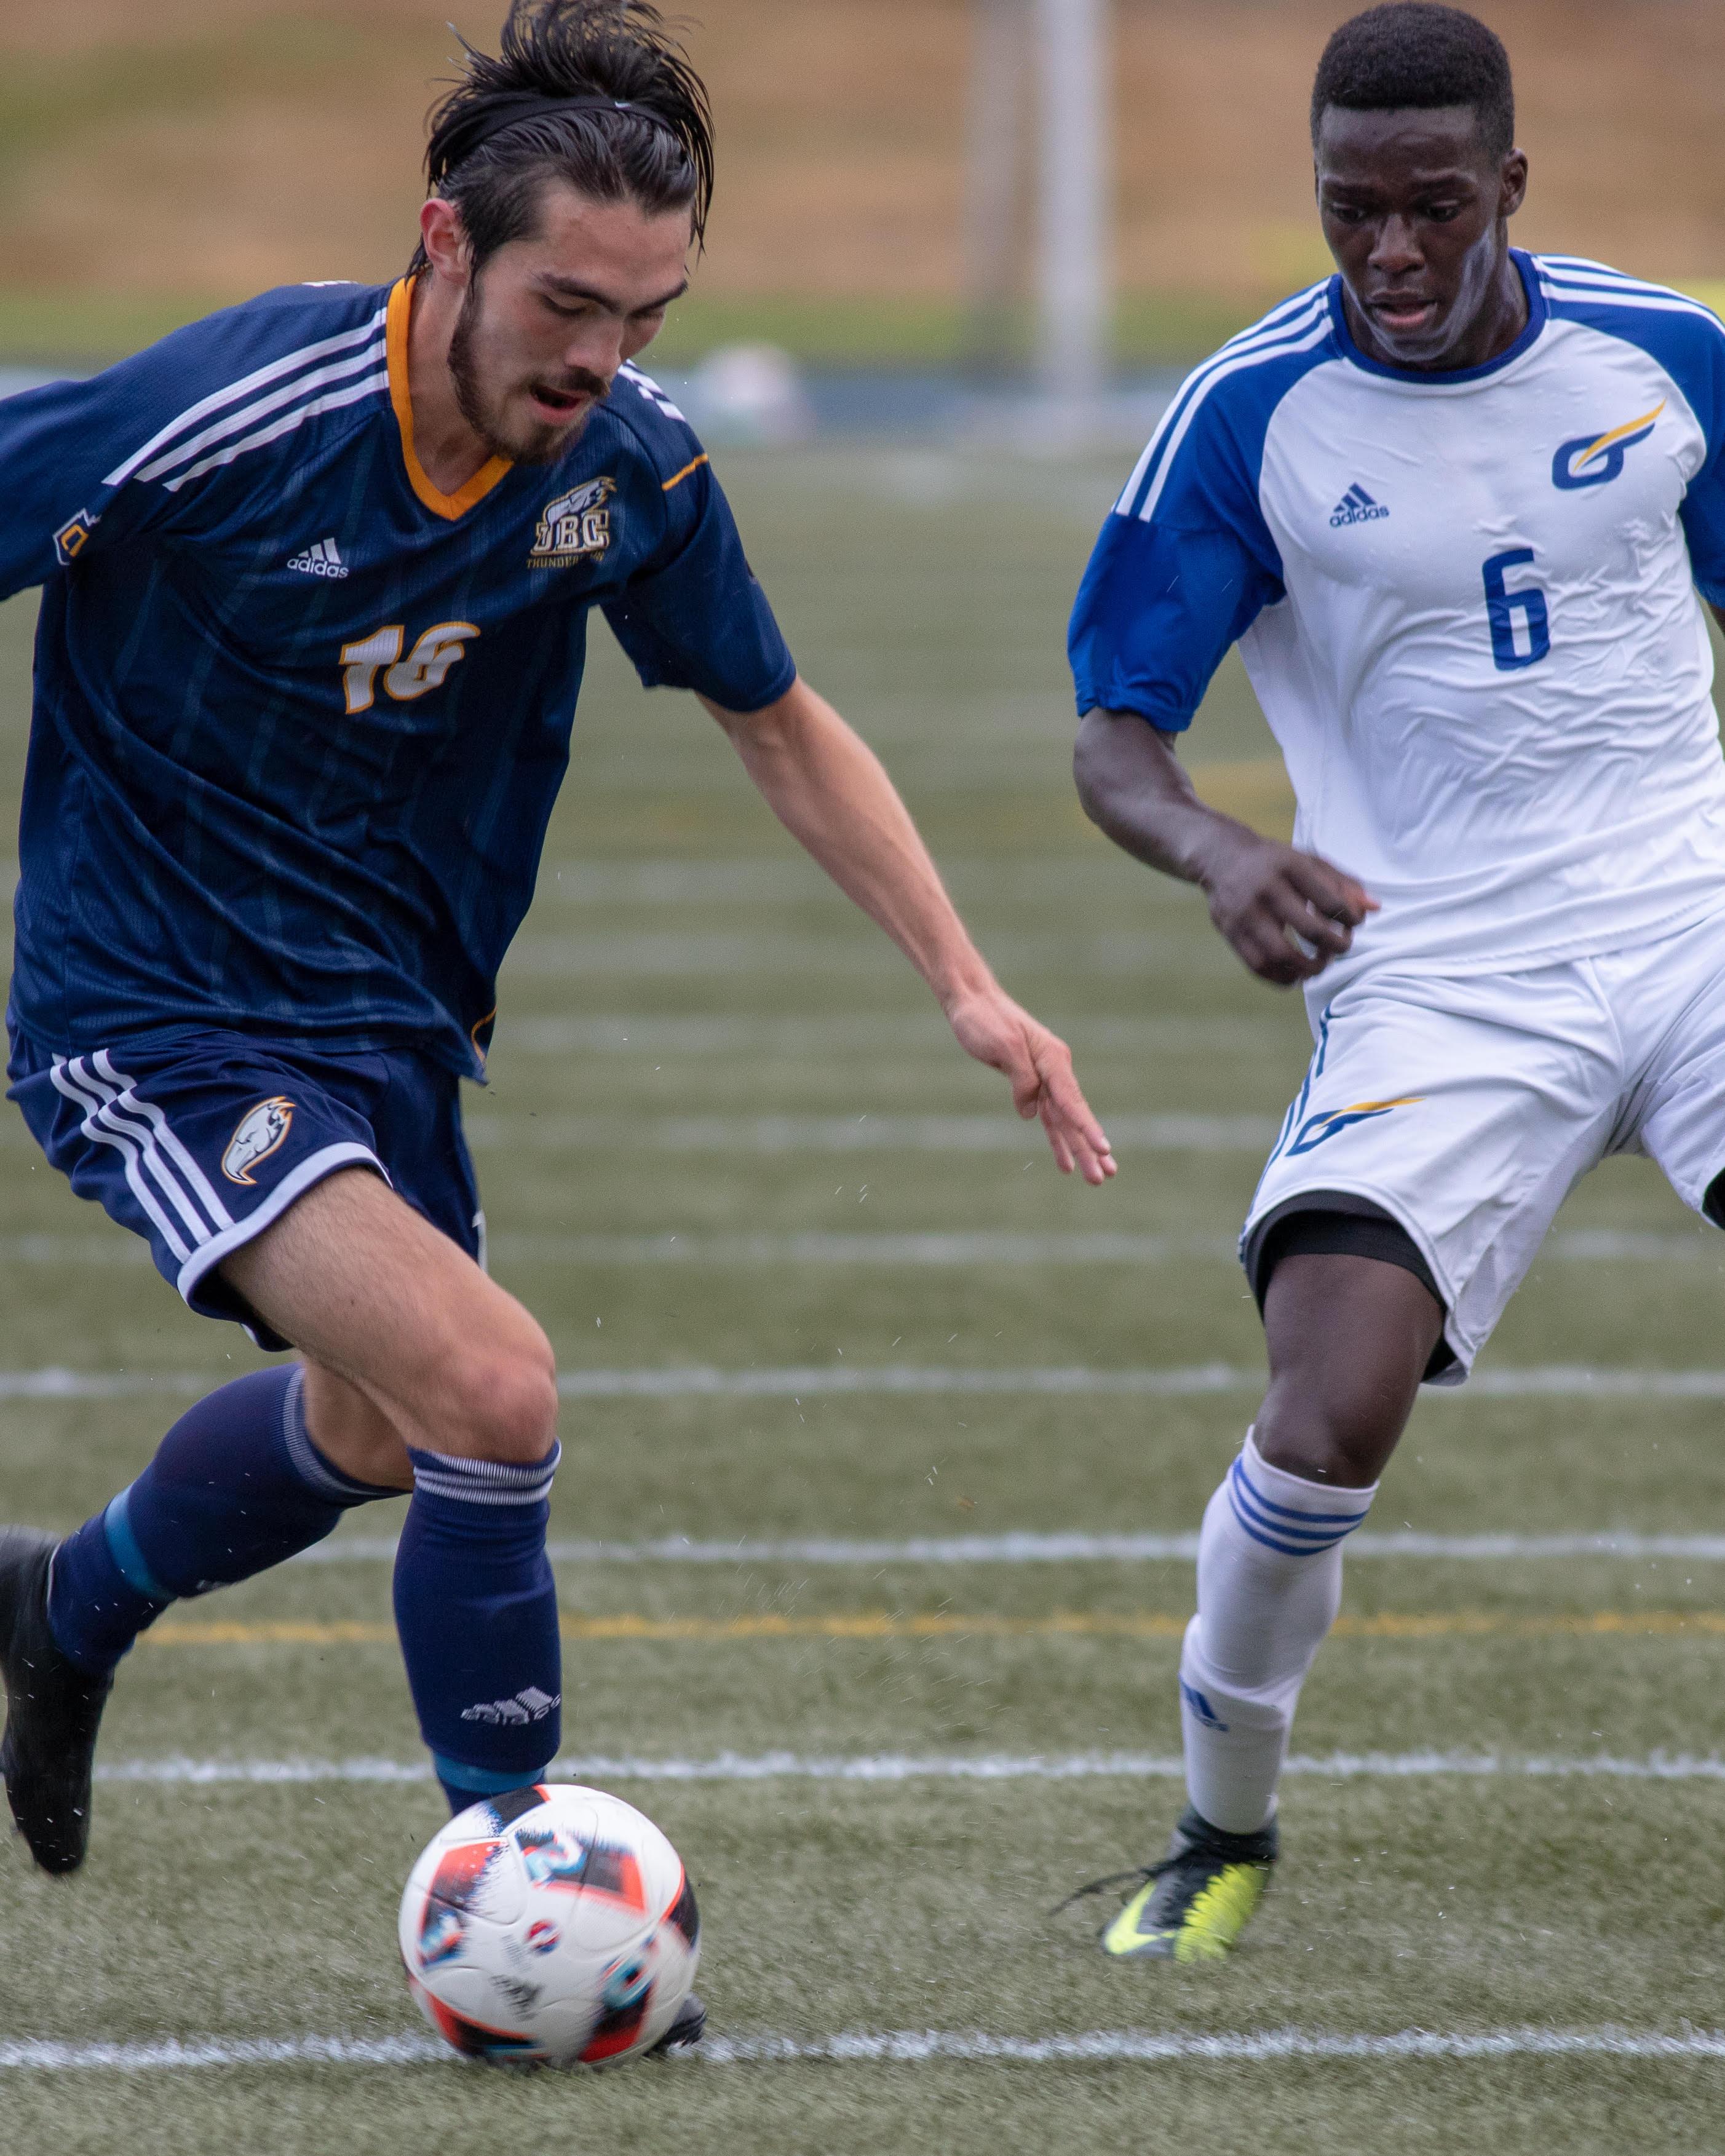 UBC's Taiyo Marzalik takes on UBCO's Aaron Maluma.